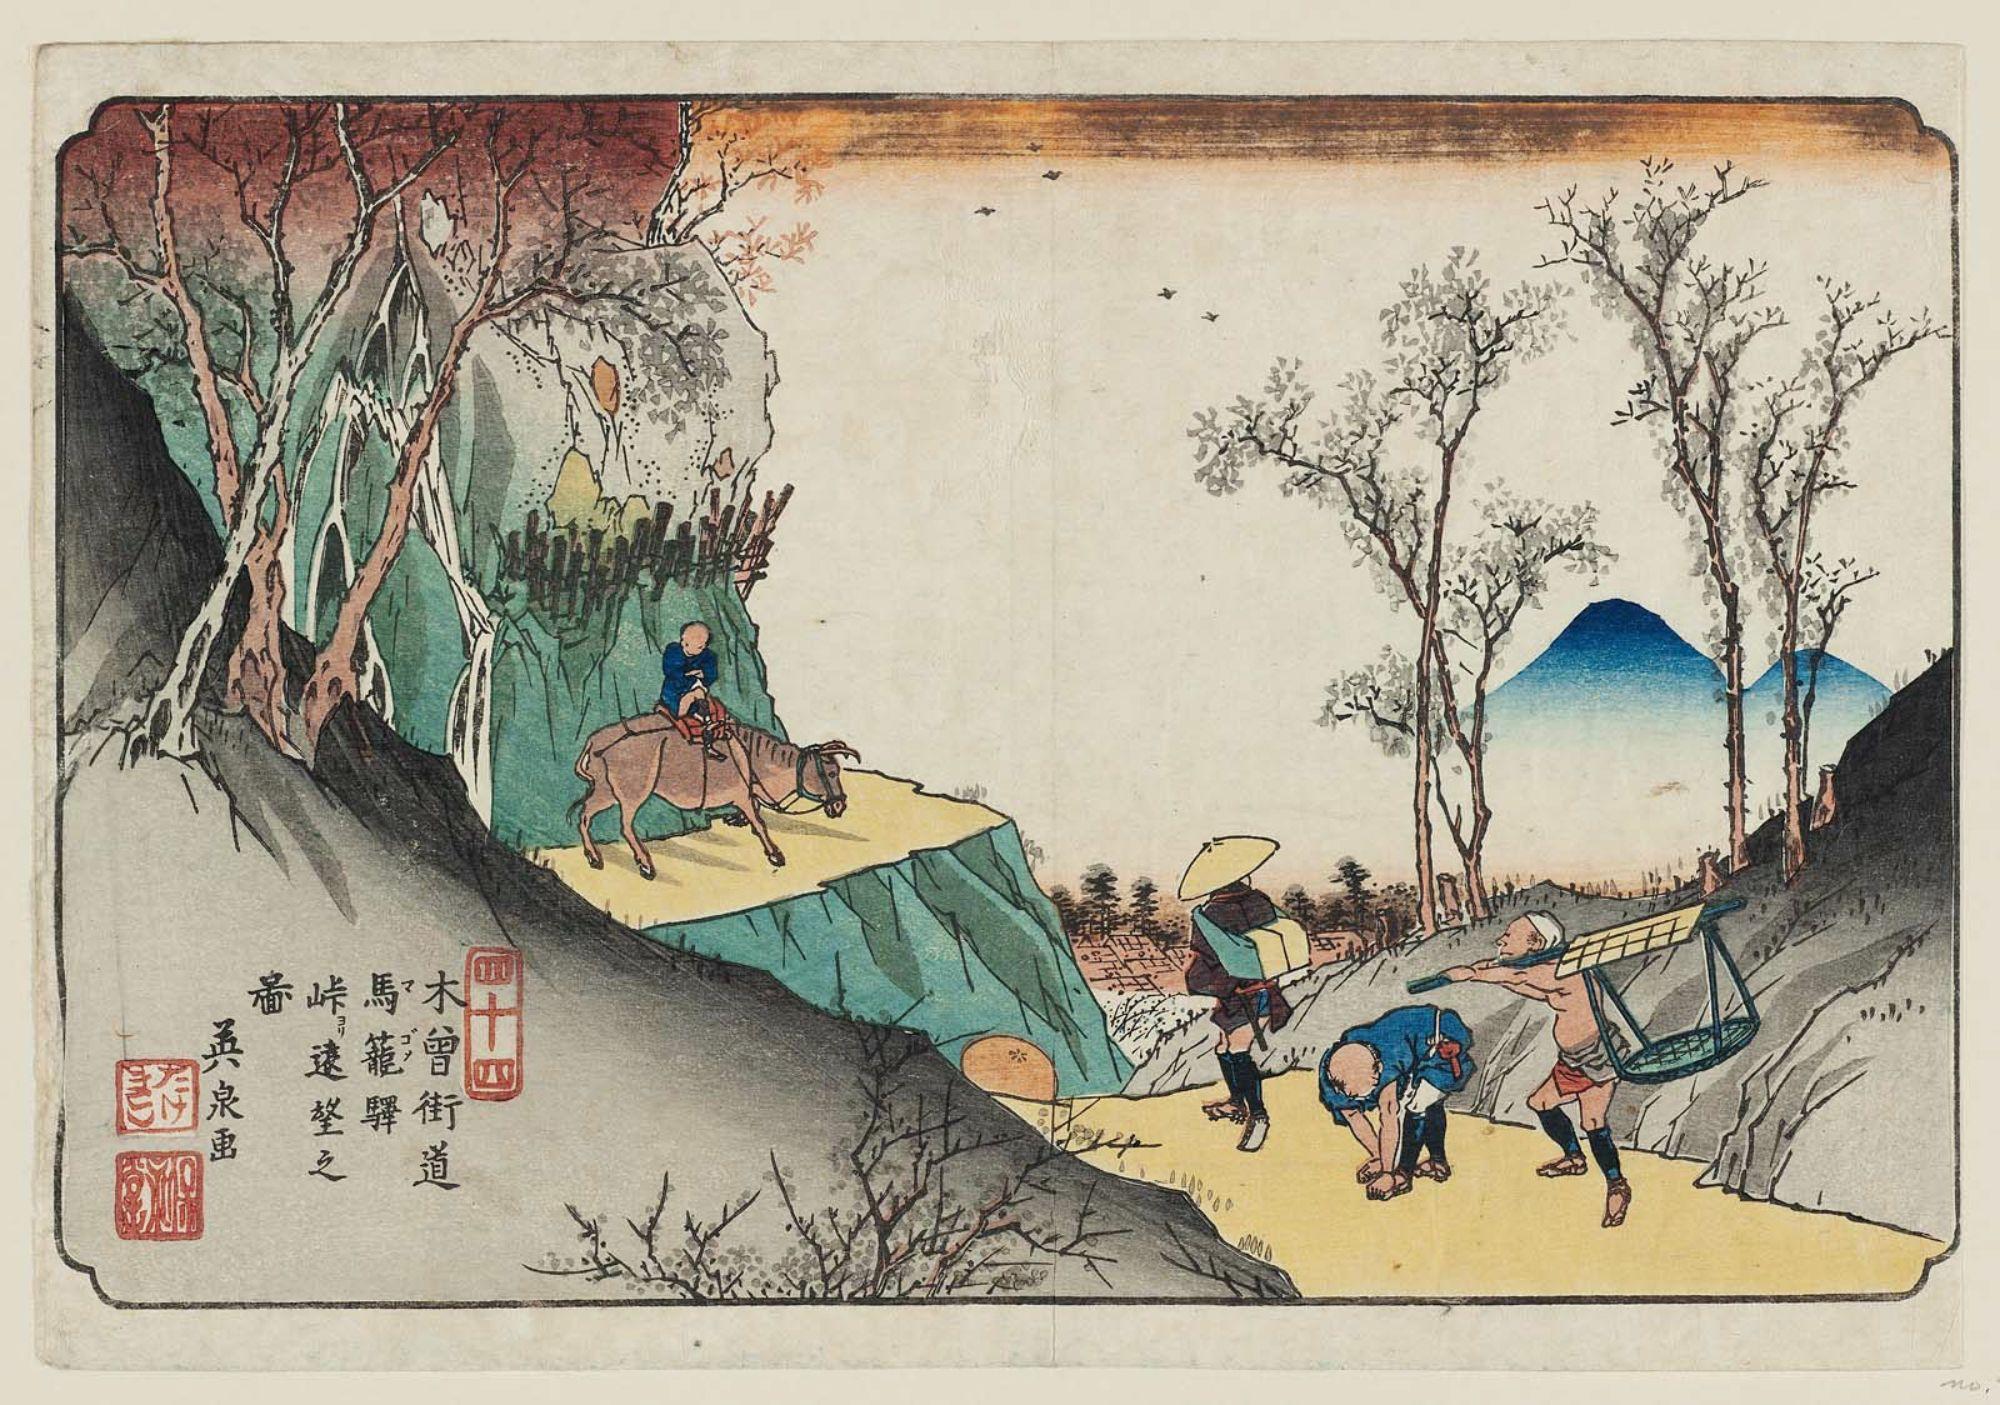 https://data.ukiyo-e.org/mfa/images/sc207600.jpg